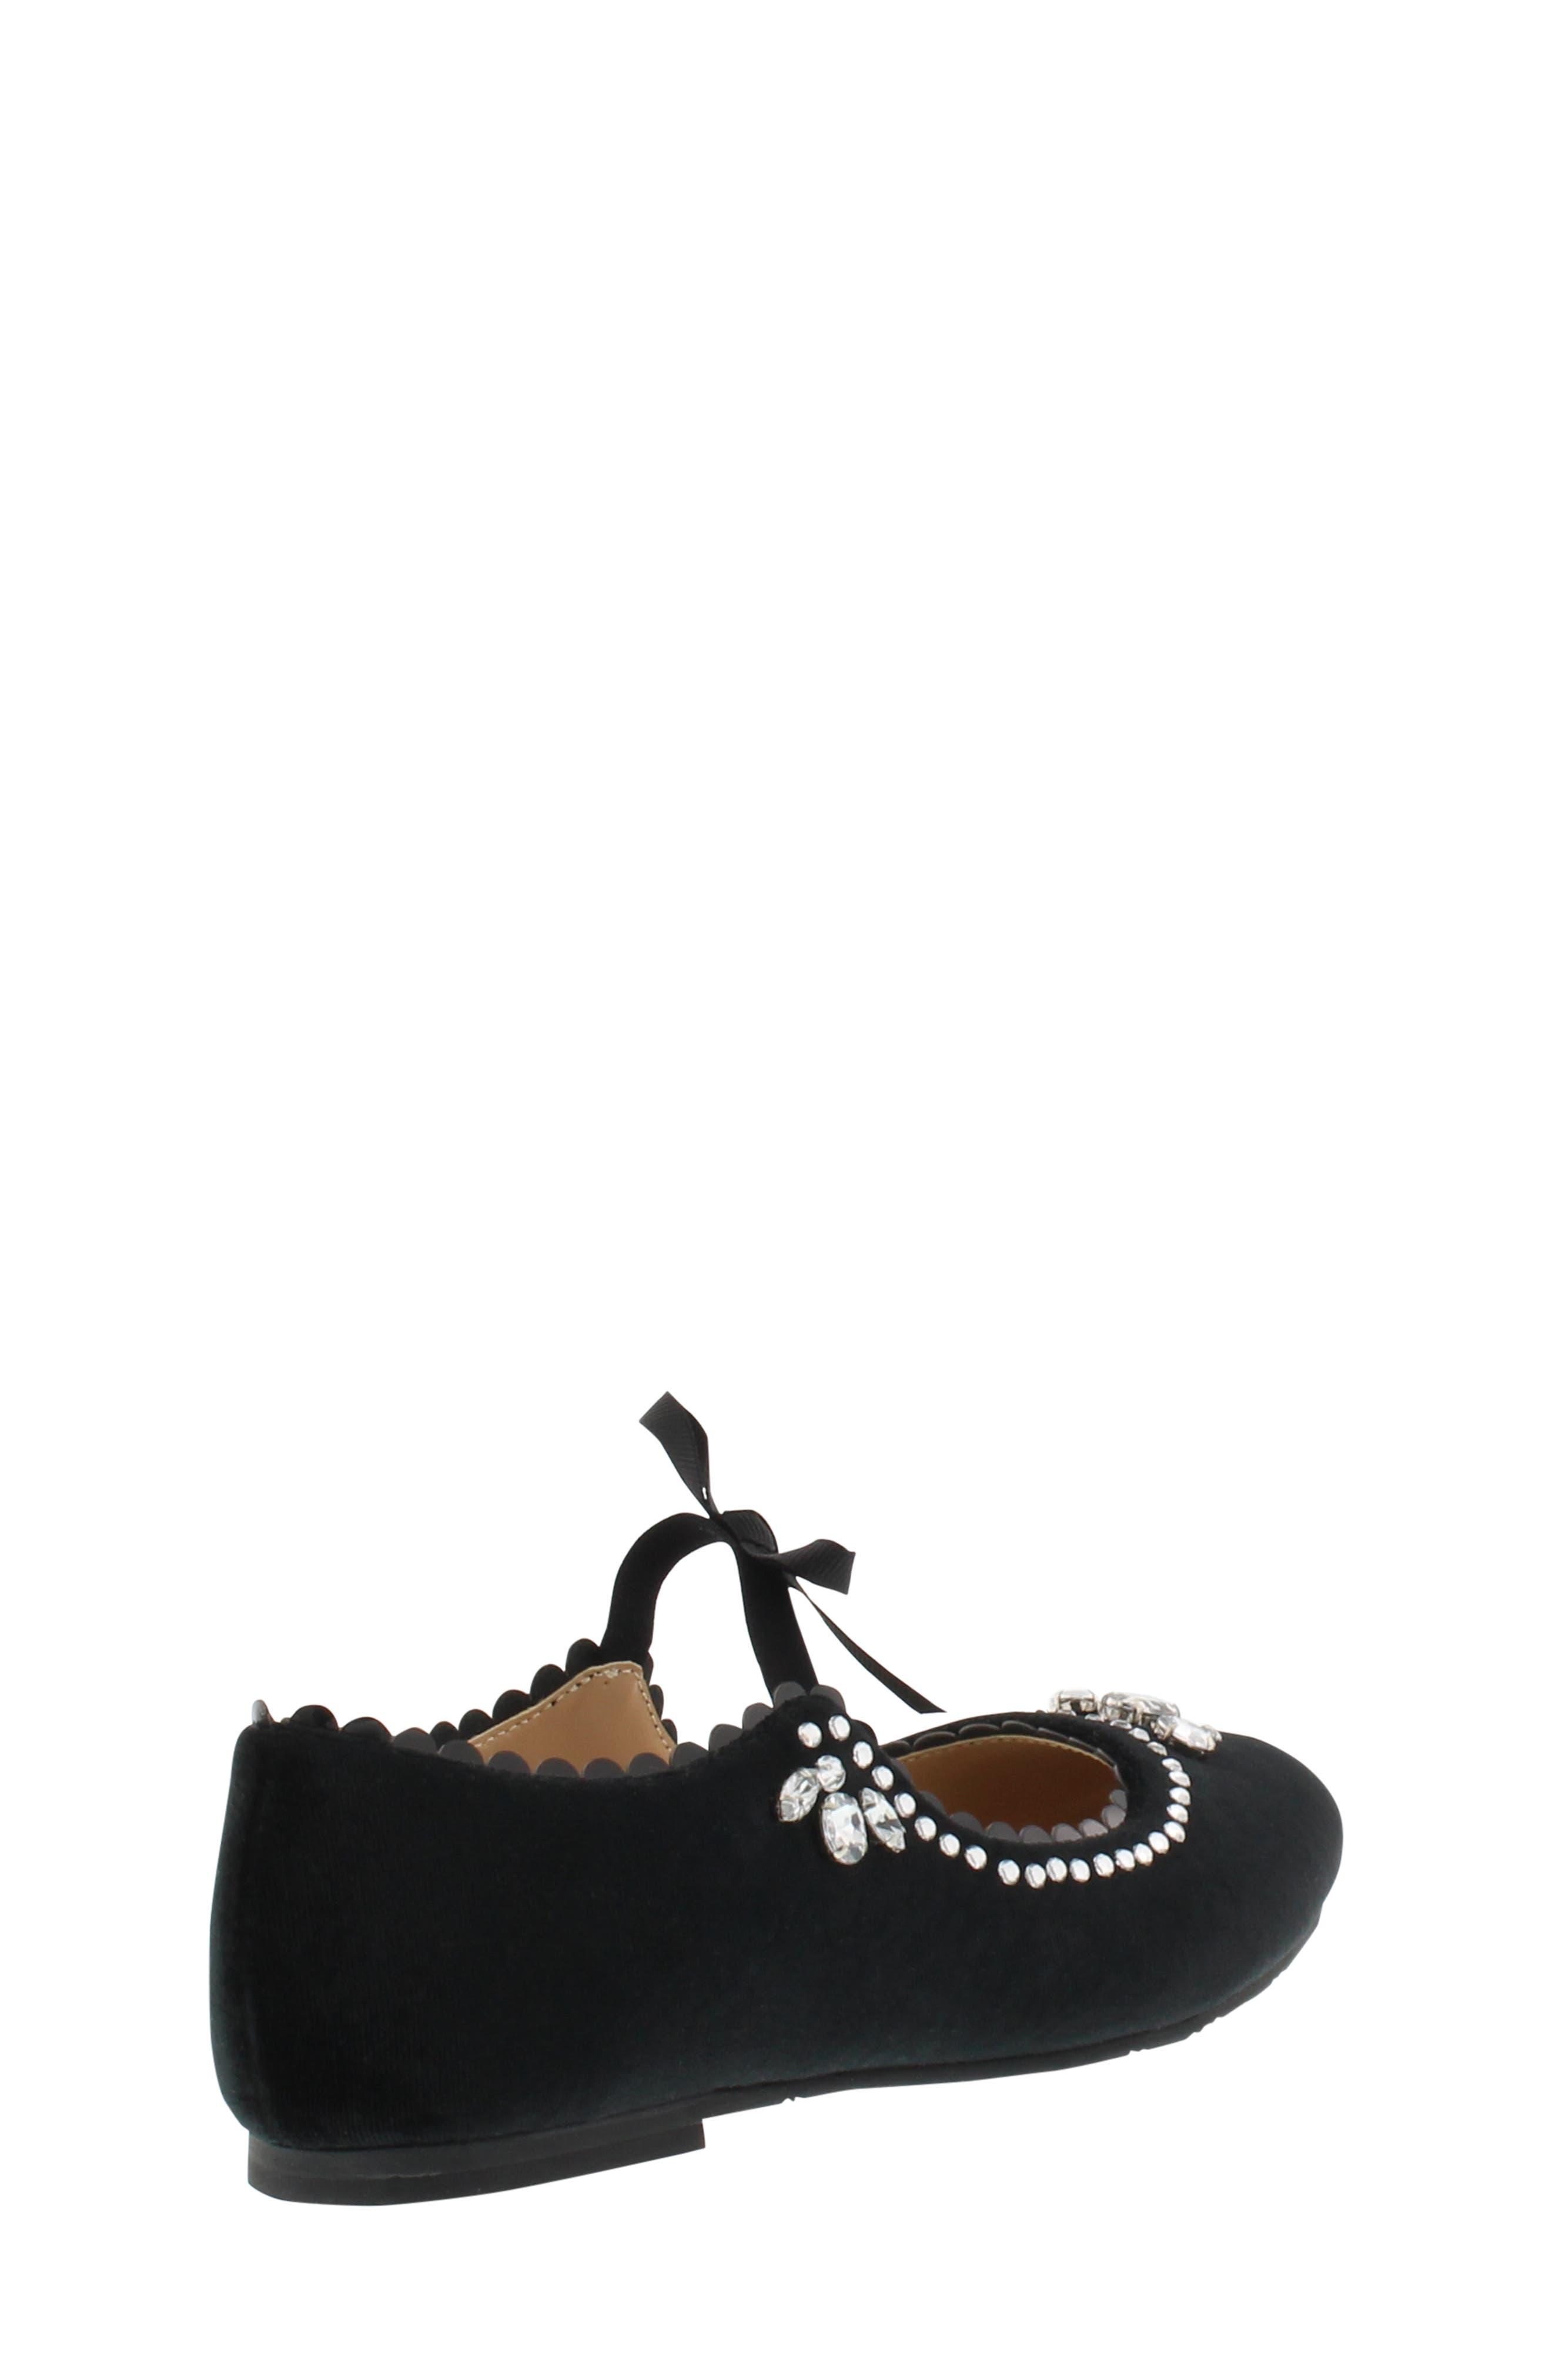 Badgley Mischka Amber Scallop Embellished Flat,                             Alternate thumbnail 2, color,                             BLACK